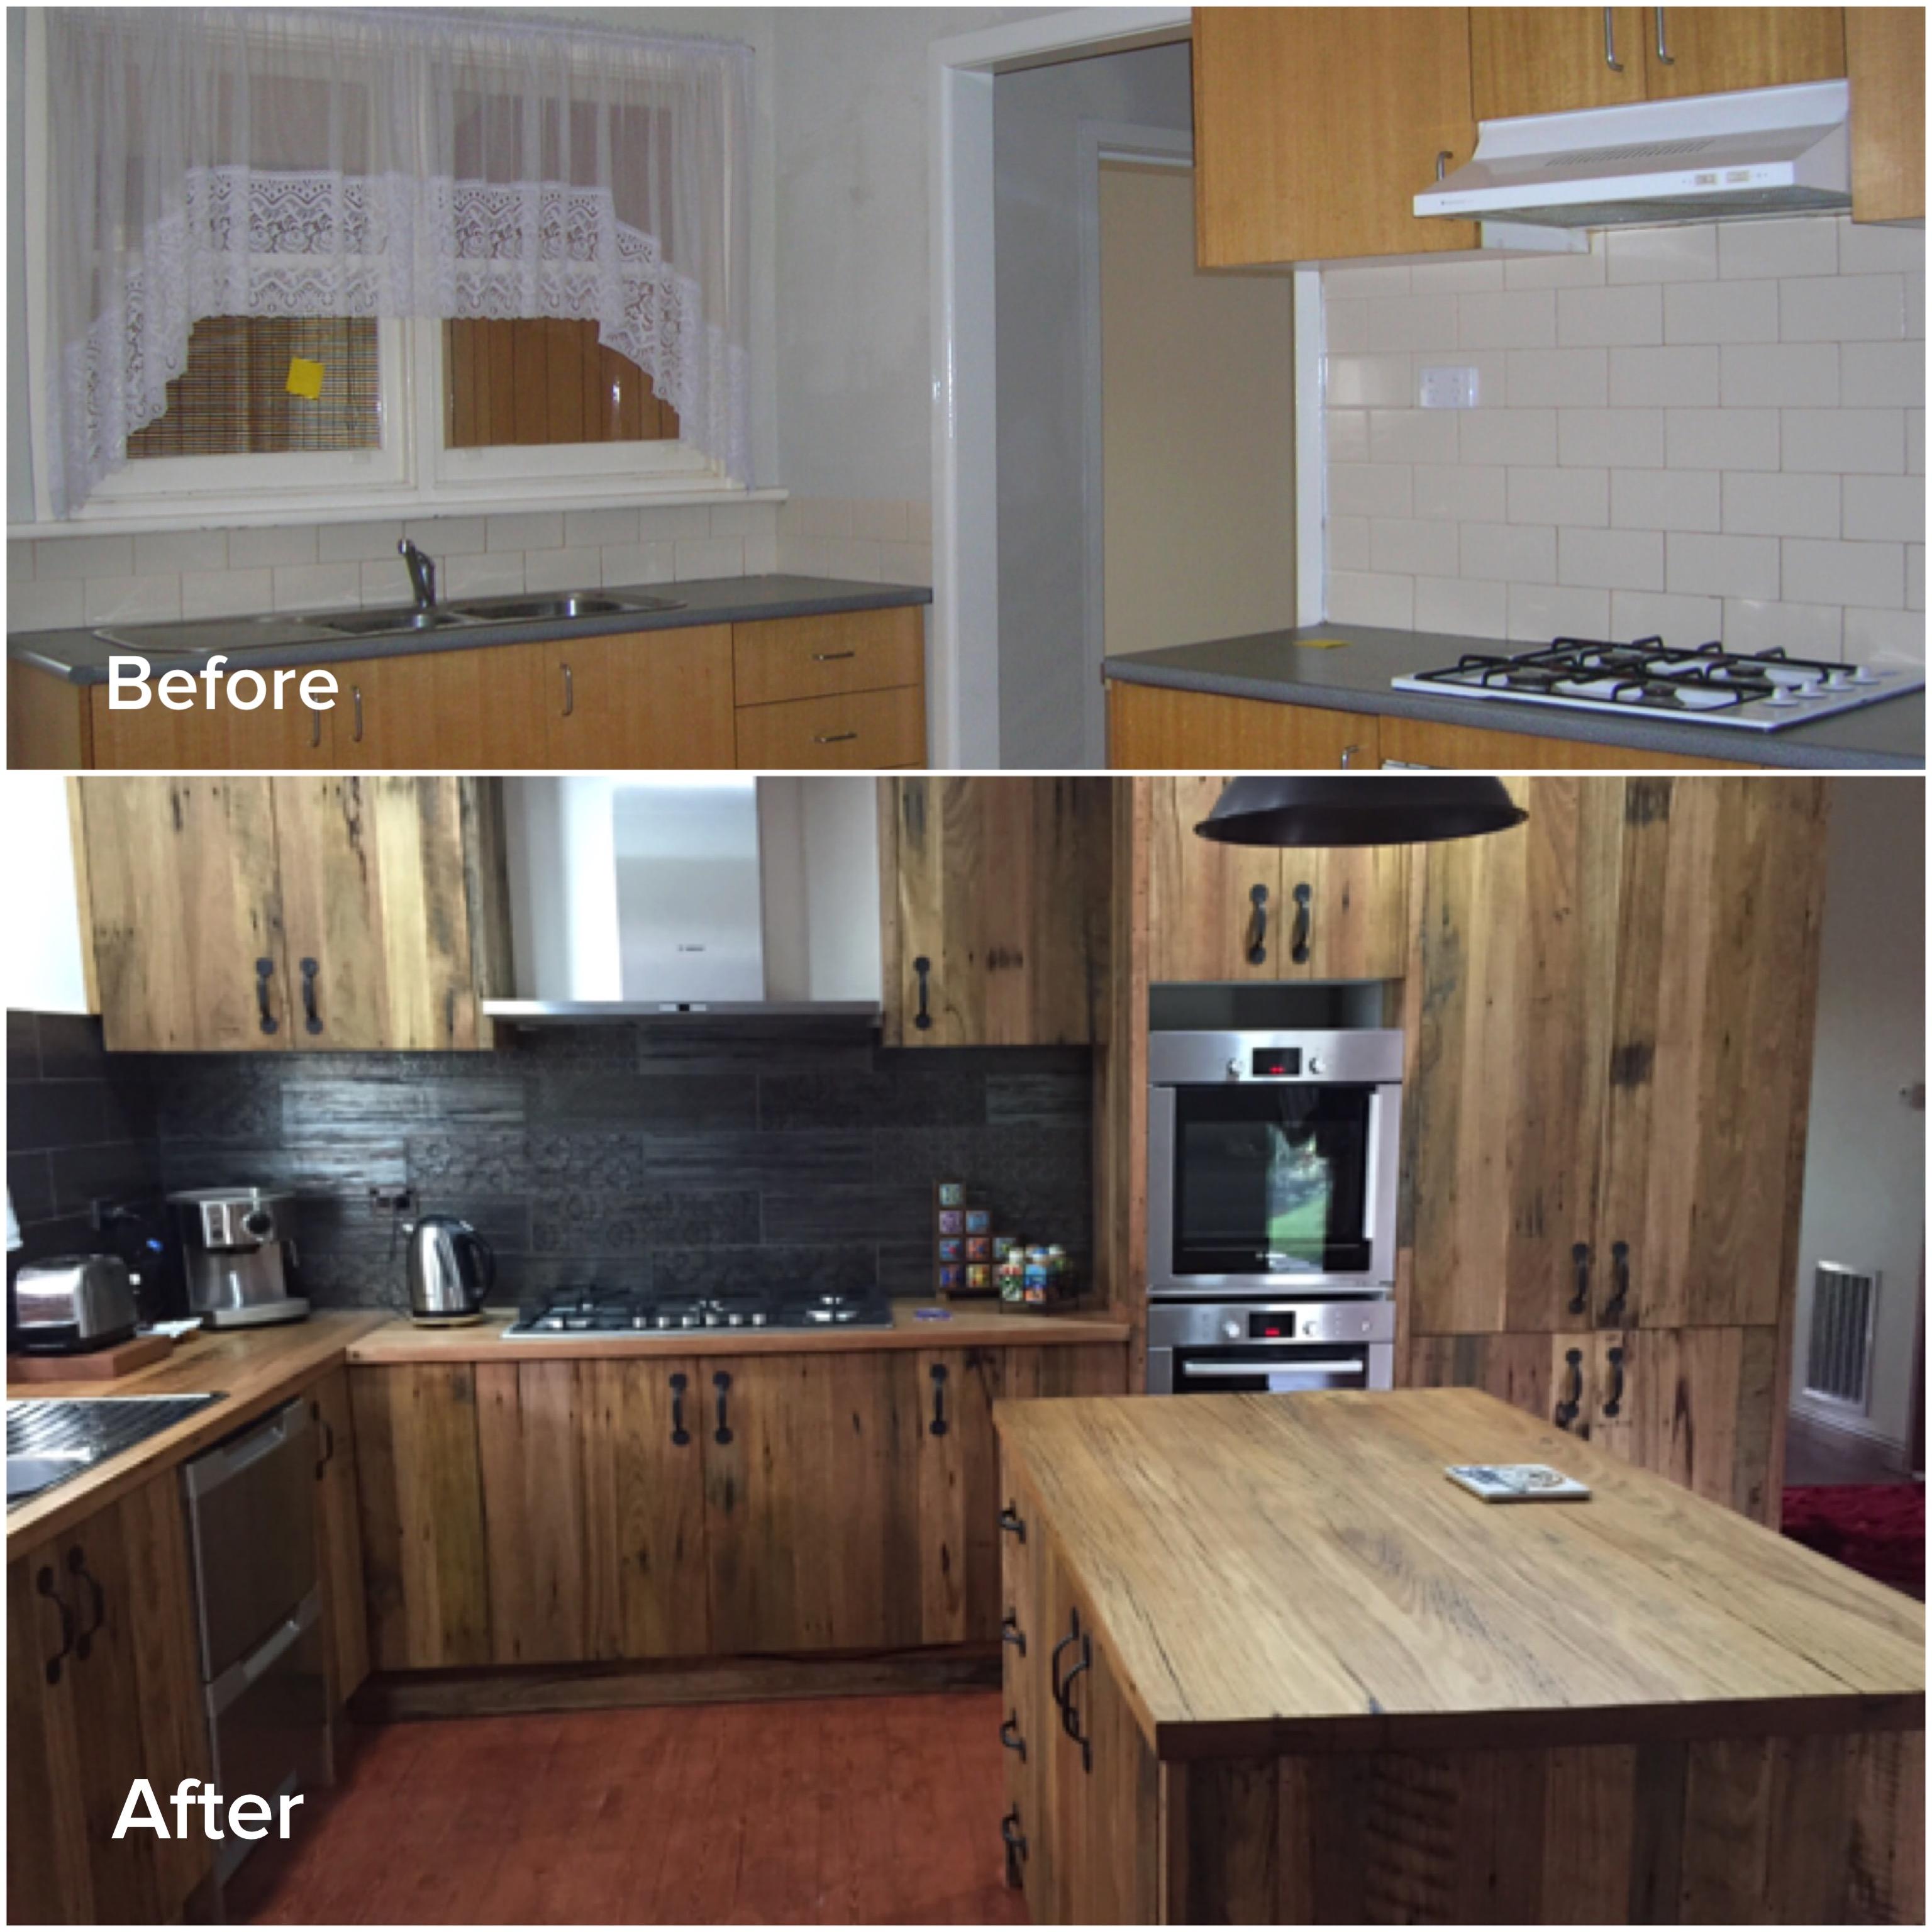 kinsale - kitchen before after